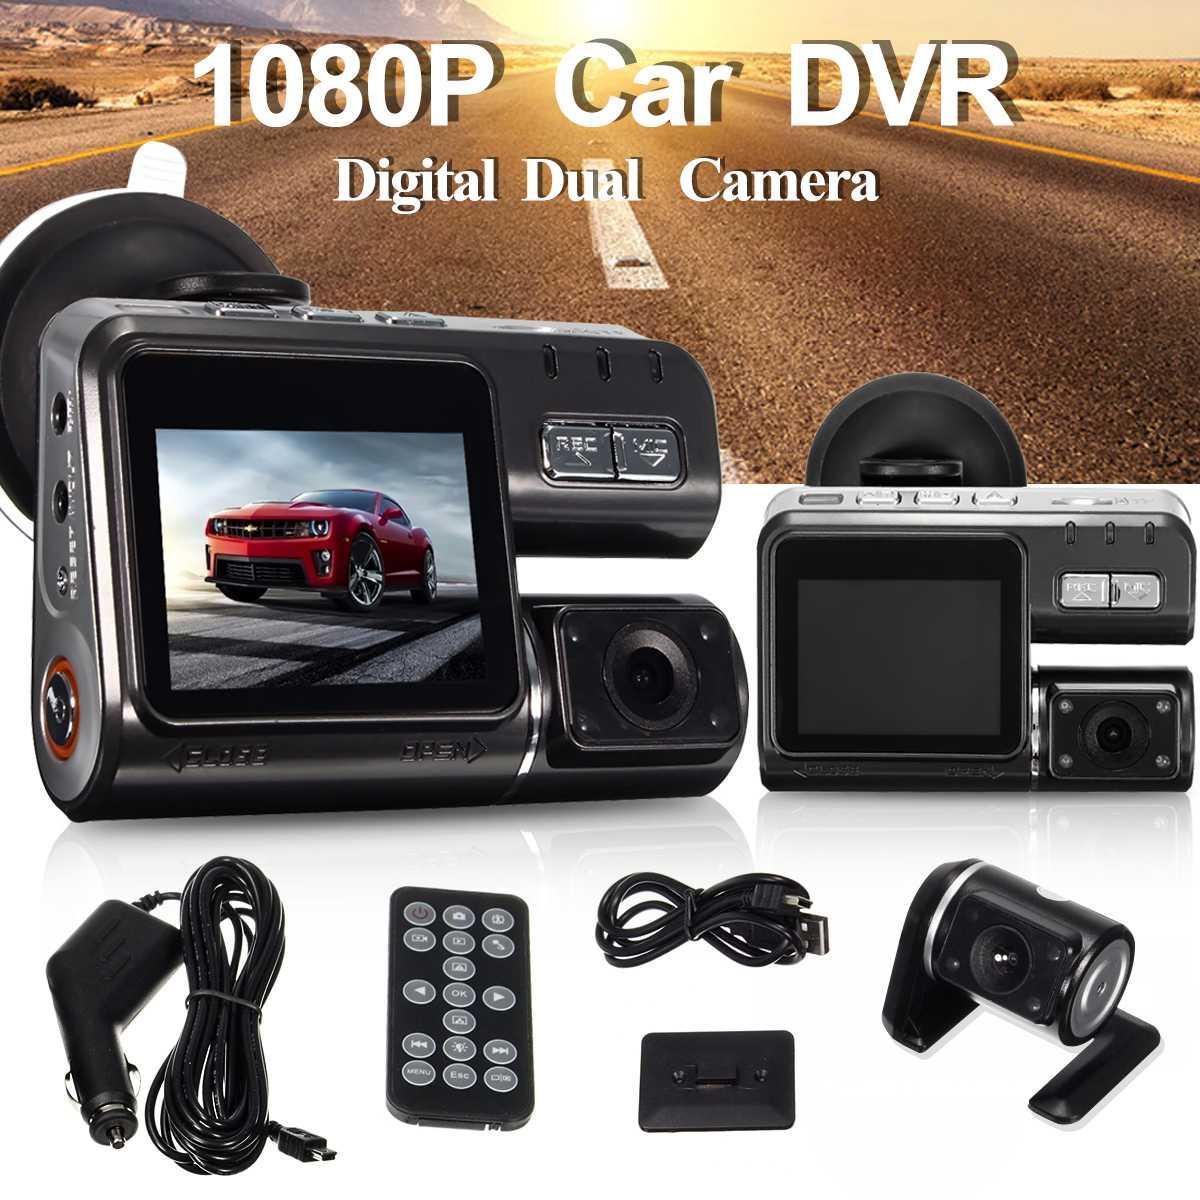 1080 p coche DVR grabador Dash Cam Dual lente trasera del vehículo Cámara videocámara noche visión Dashcam Cámara DVR